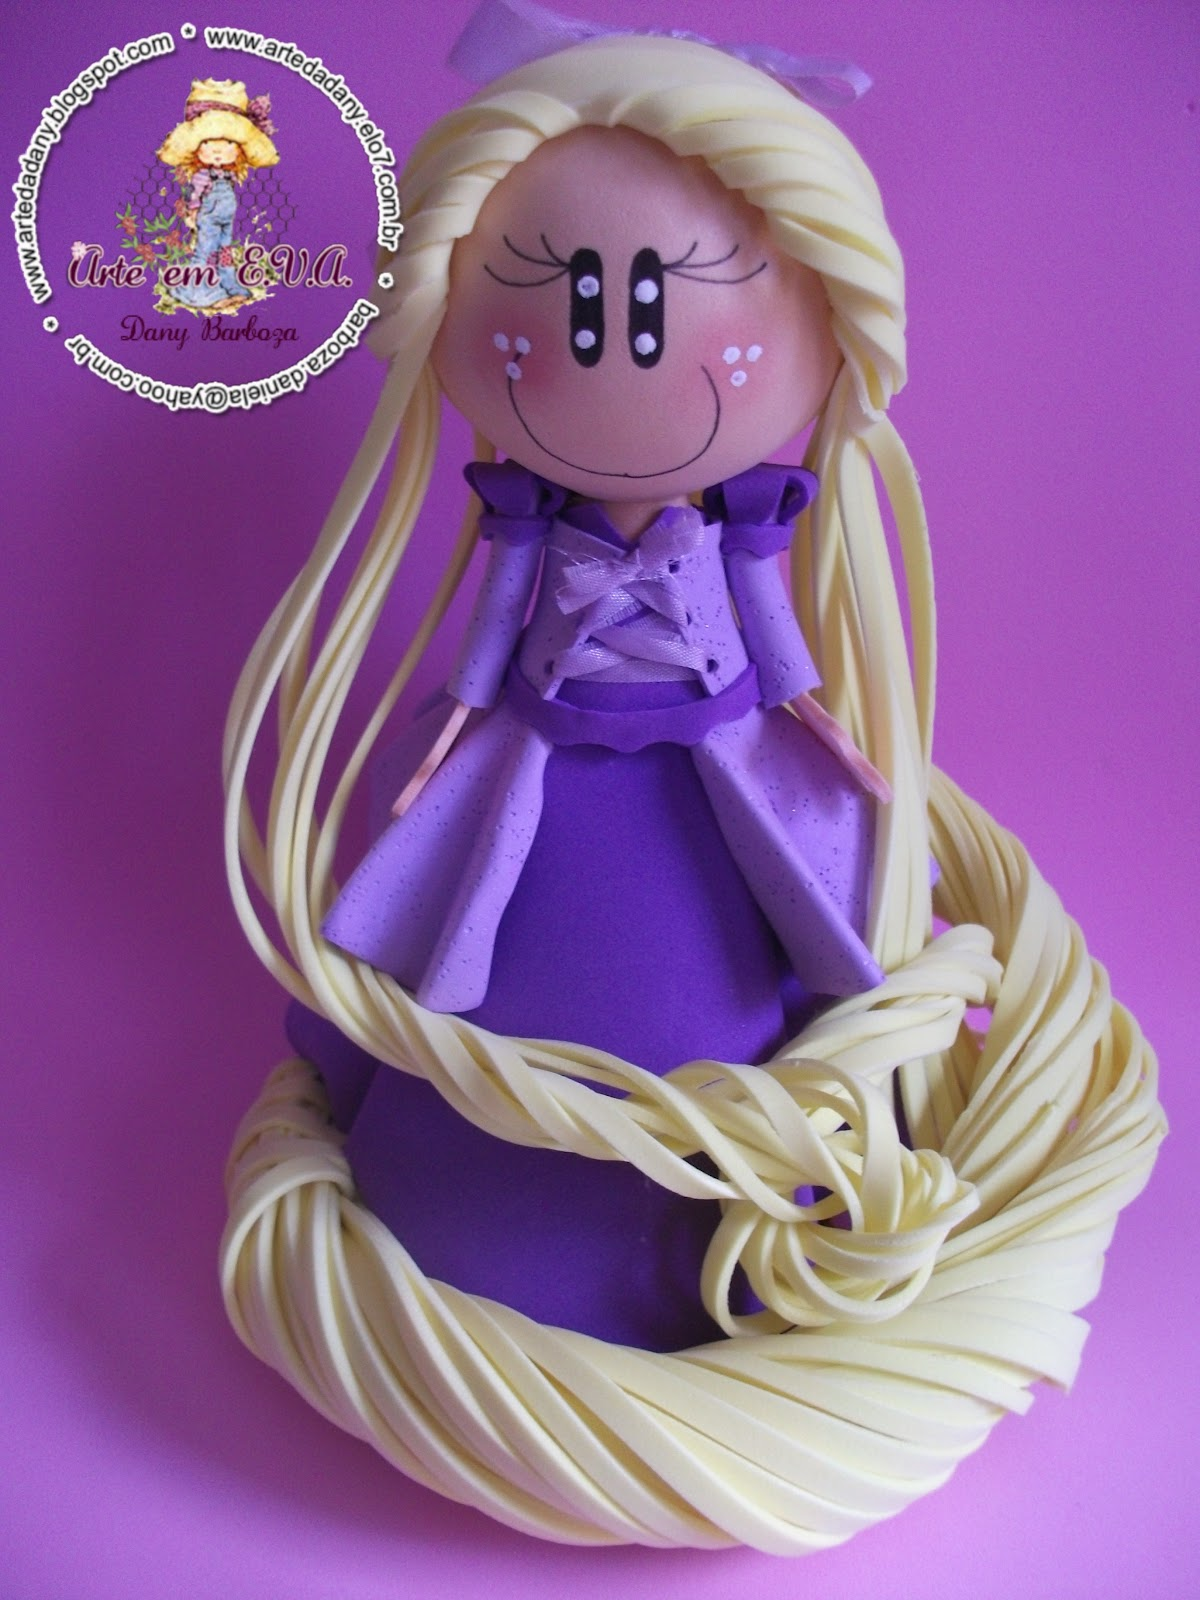 Fofucha Rapunzel E Seus Loooongos Cabelos